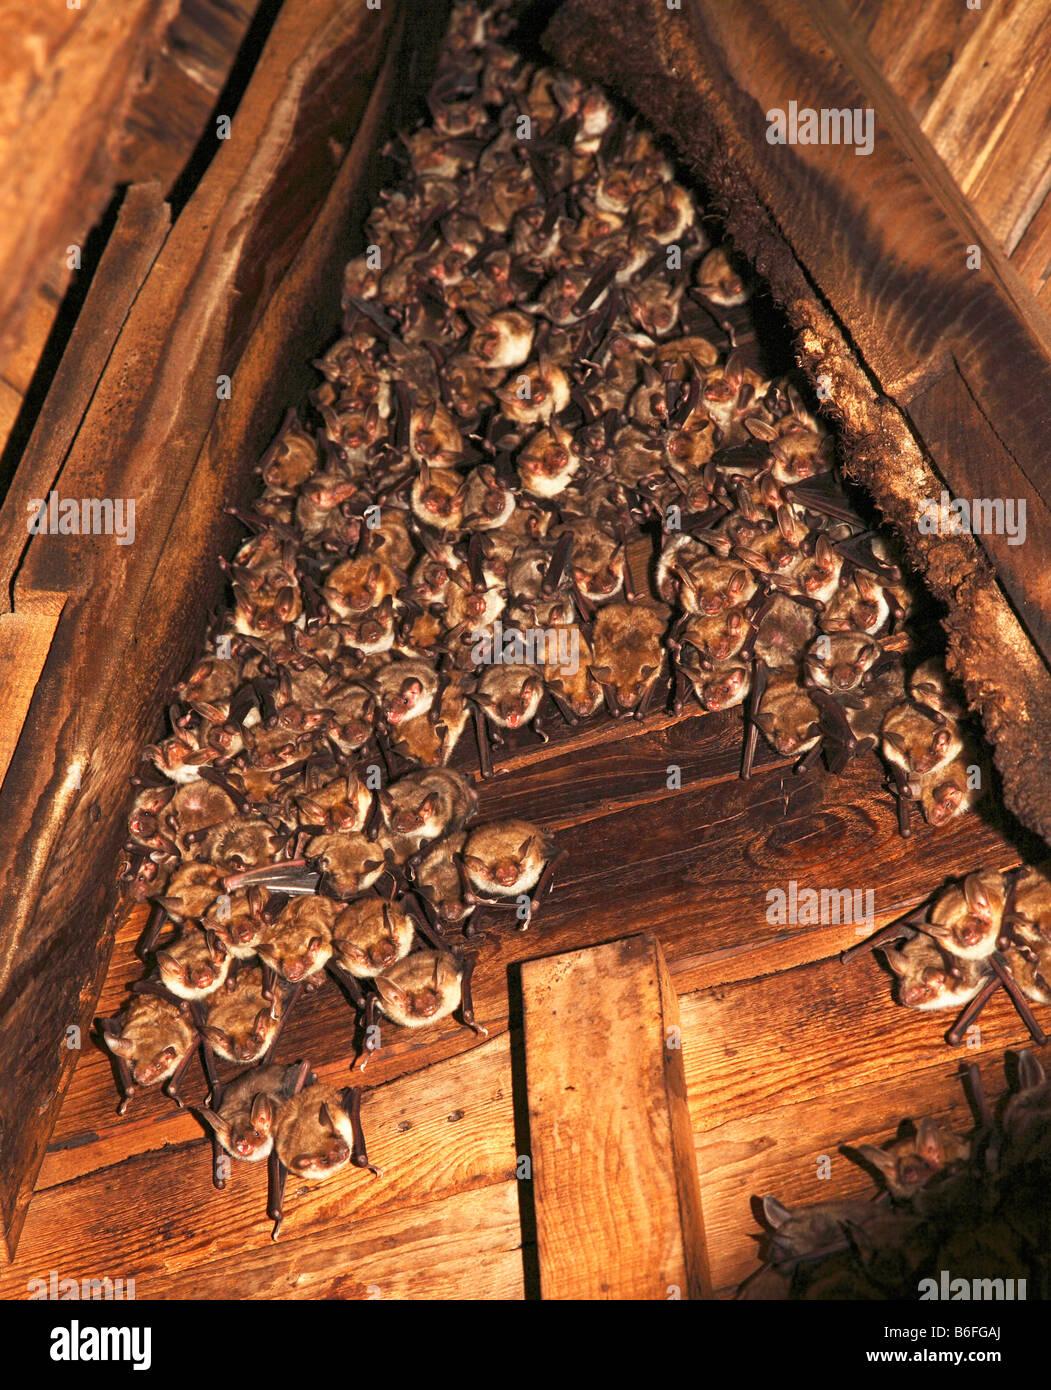 Greater mouse-eared bat (Myotis myotis) inside a church bell tower, Niederraunau, Bavaria, Germany, Europe Stock Photo